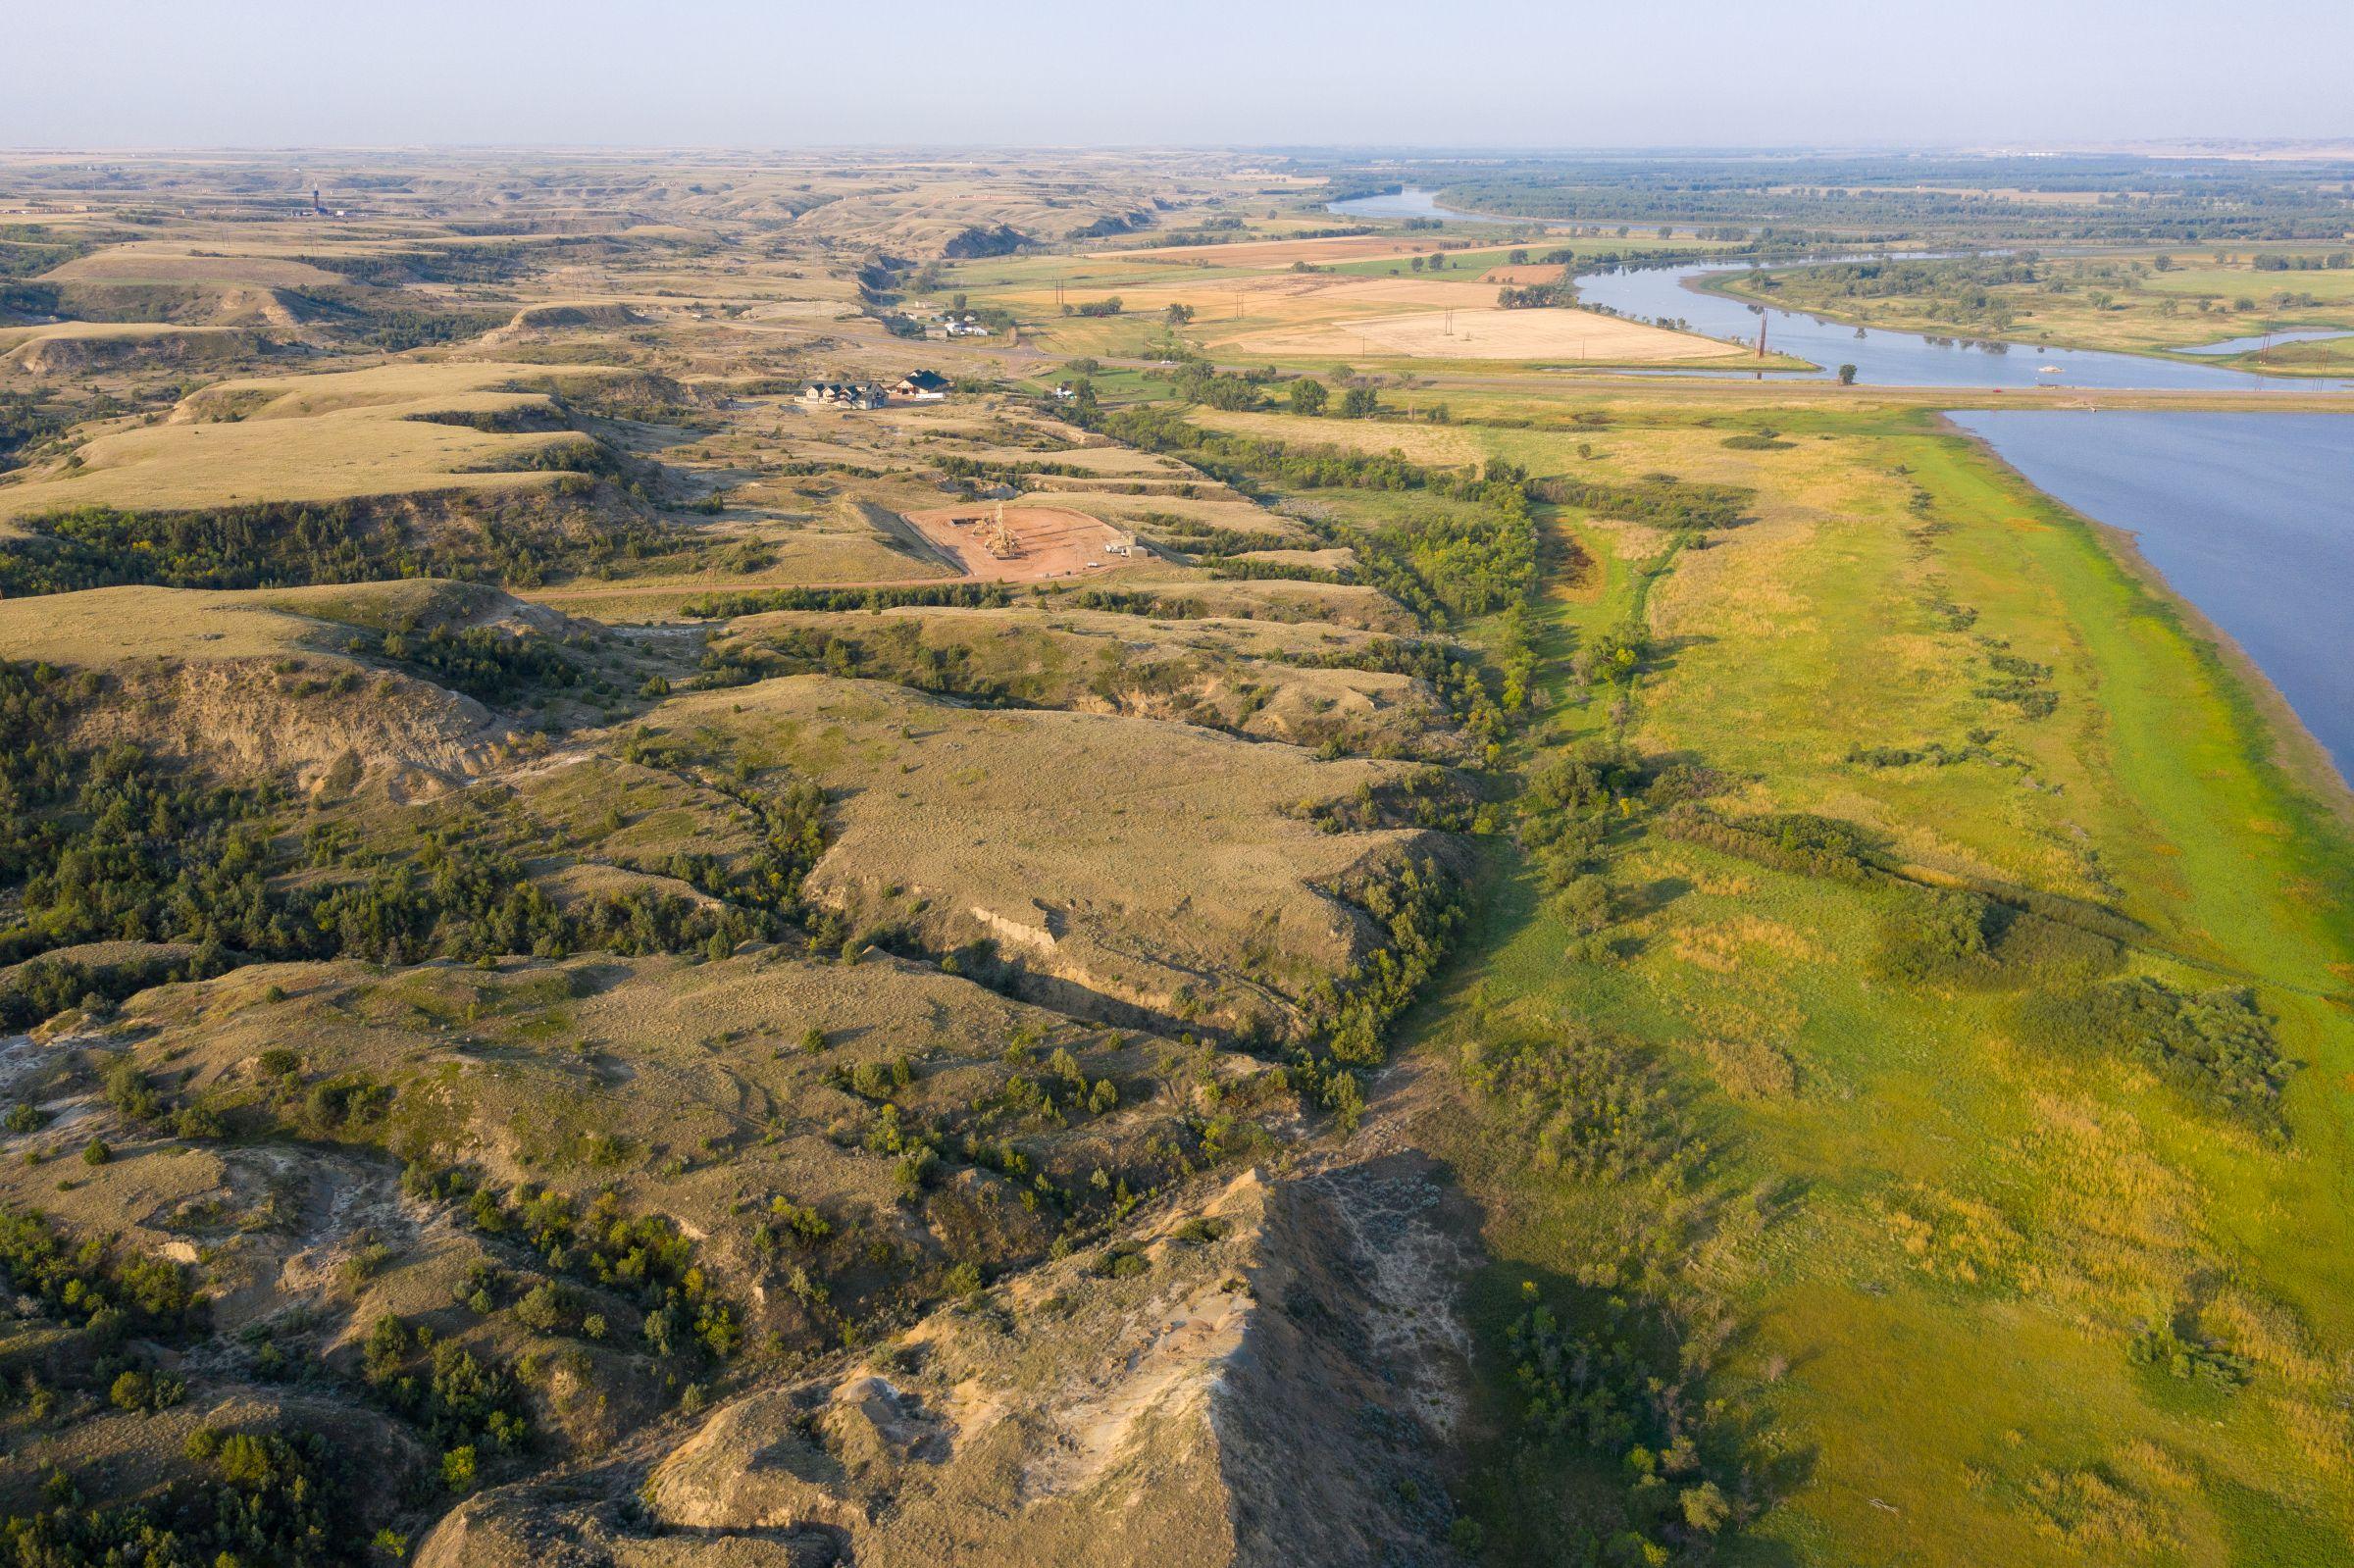 auctions-land-mckenzie-county-north-dakota-270-acres-listing-number-15735-1-2021-09-09-202110.jpeg